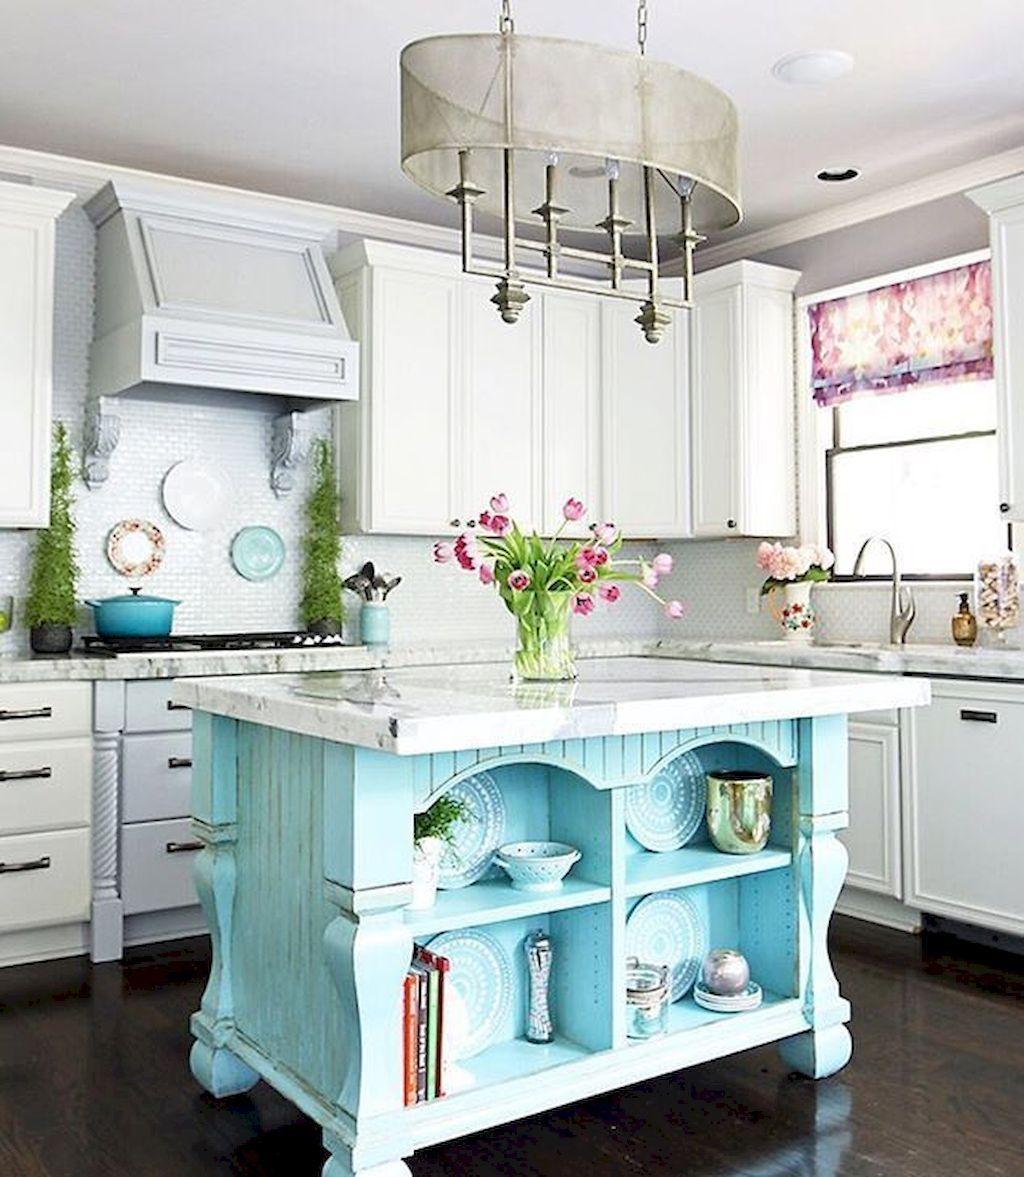 Pin by Jennie Willis on kitchen remodel | Pinterest | Grey kitchen ...